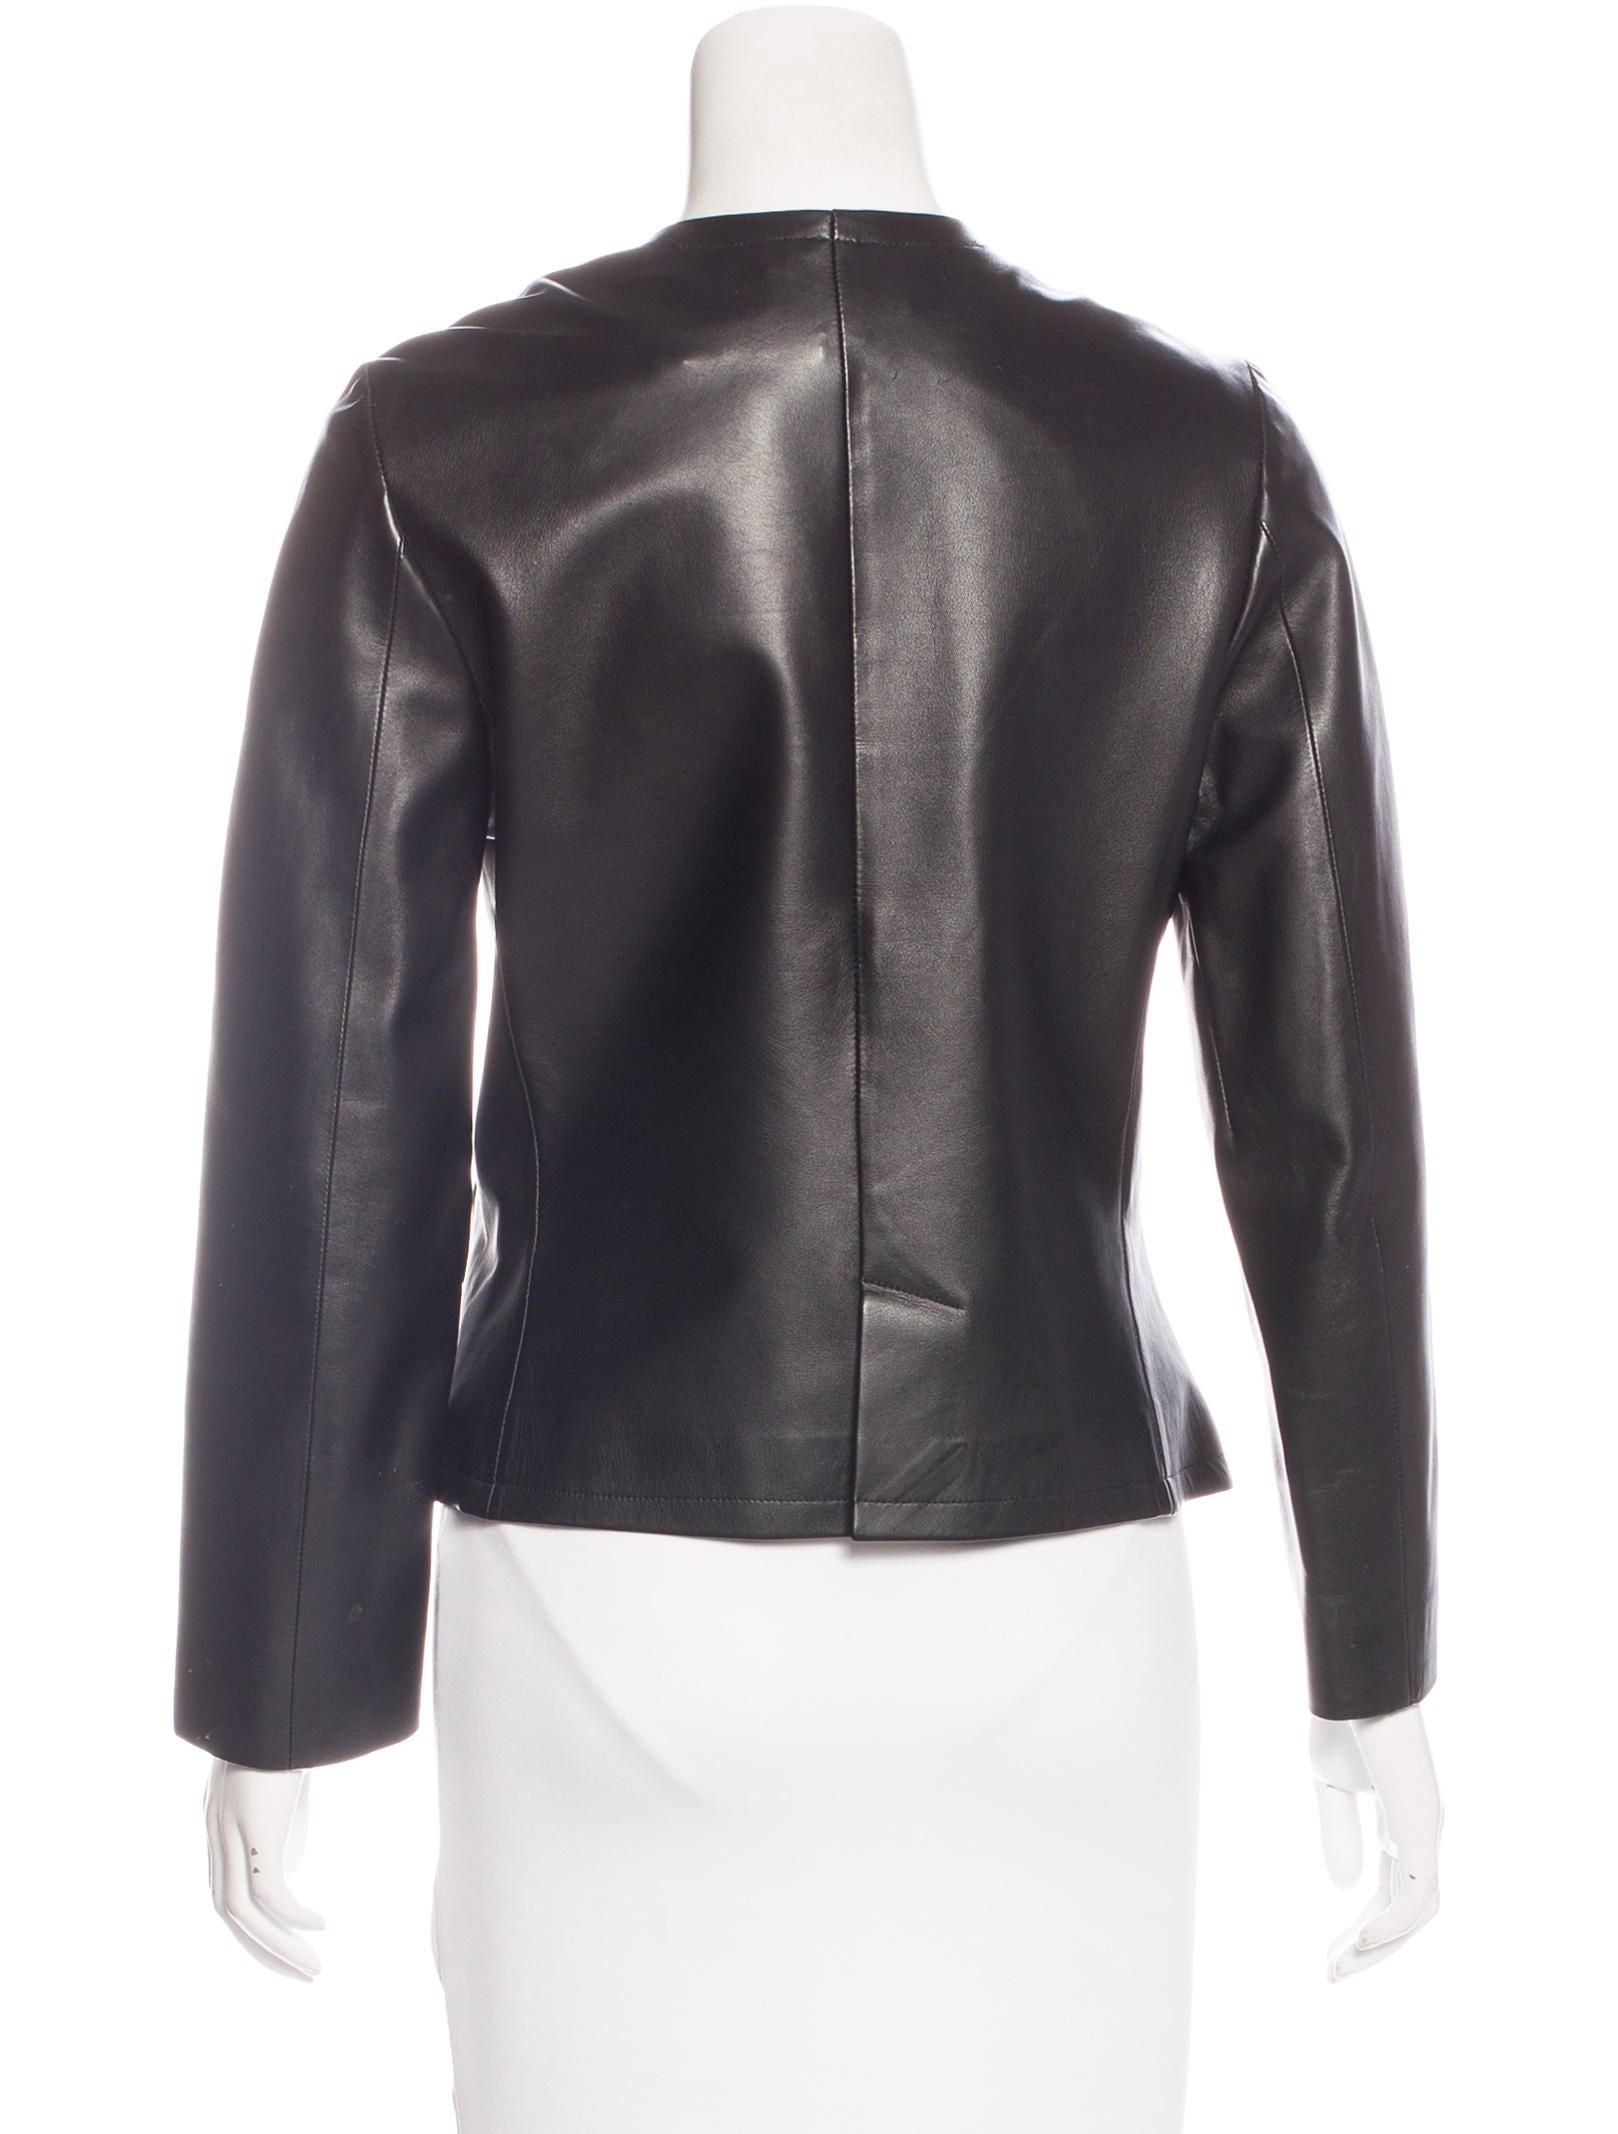 Men's Vintage Stand Collar Pu Leather Jacket